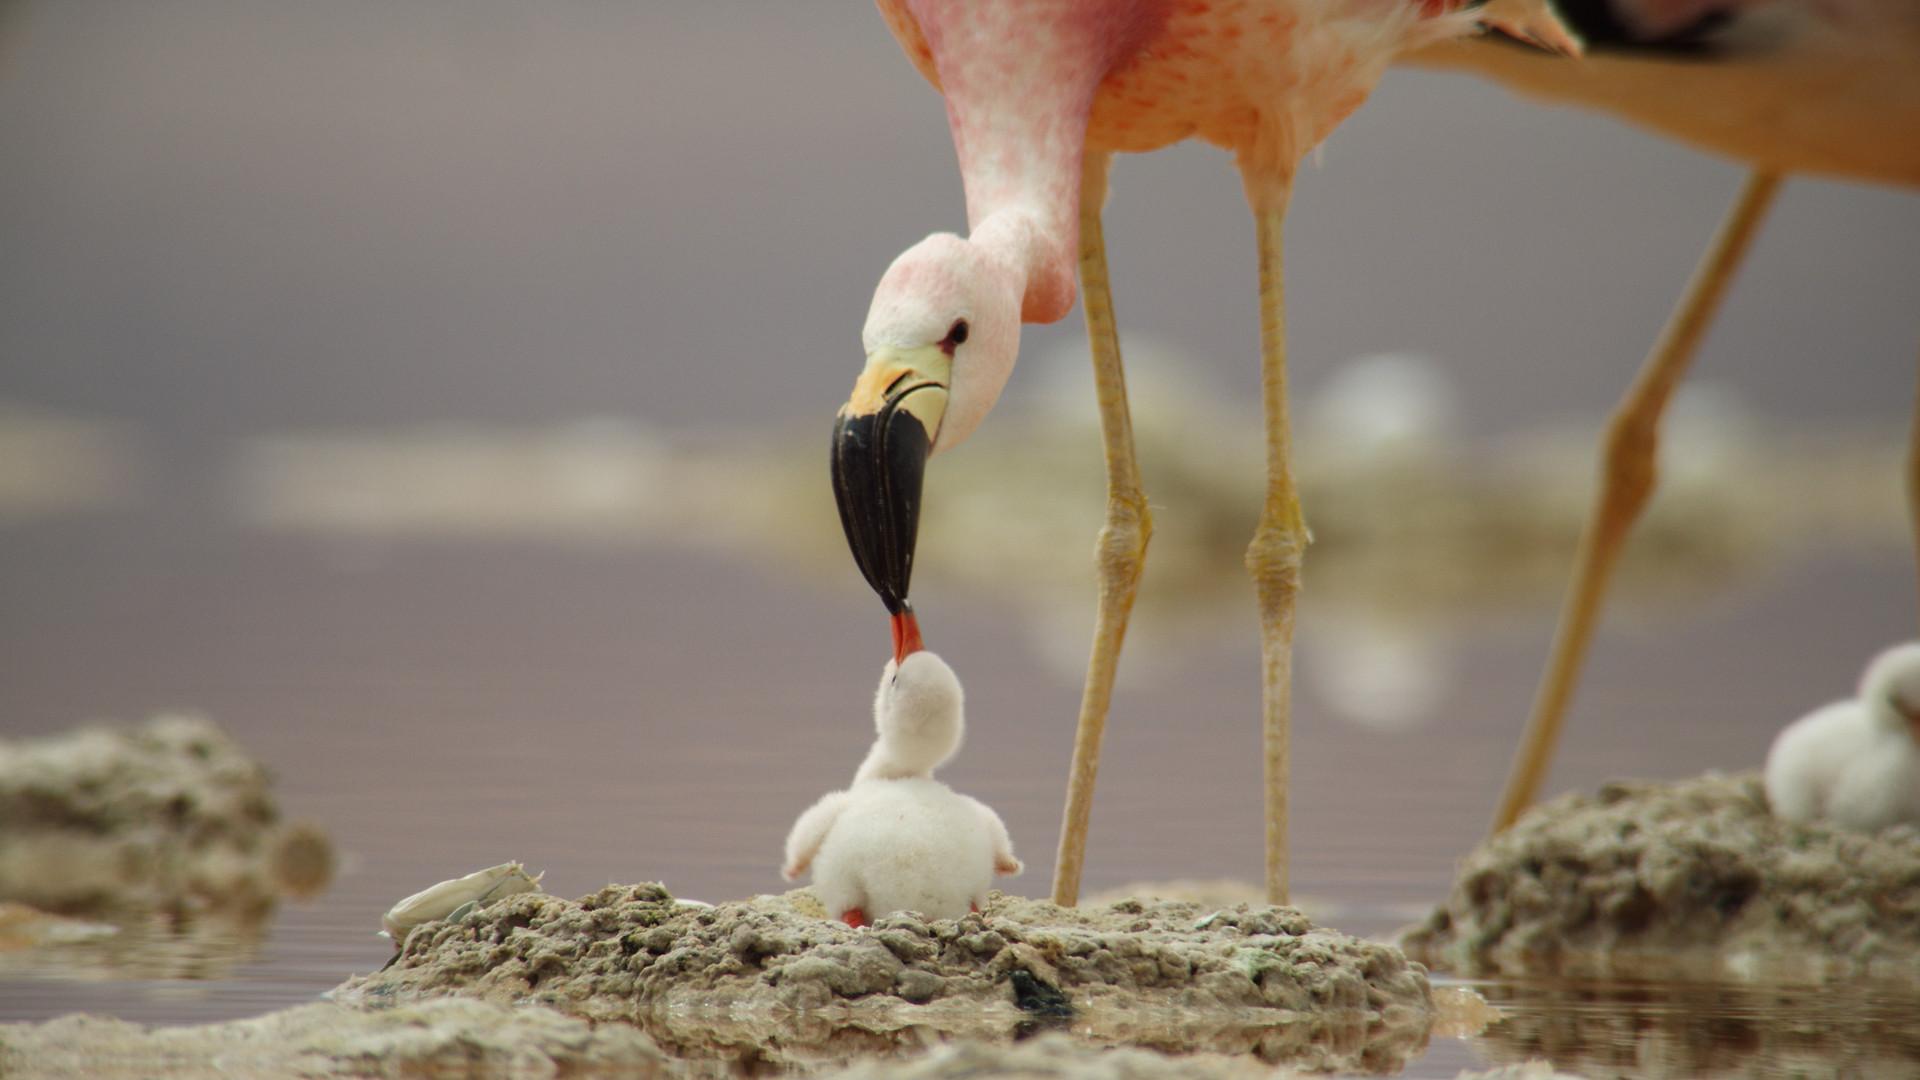 TWA_Ep2_28_flamingo.jpg